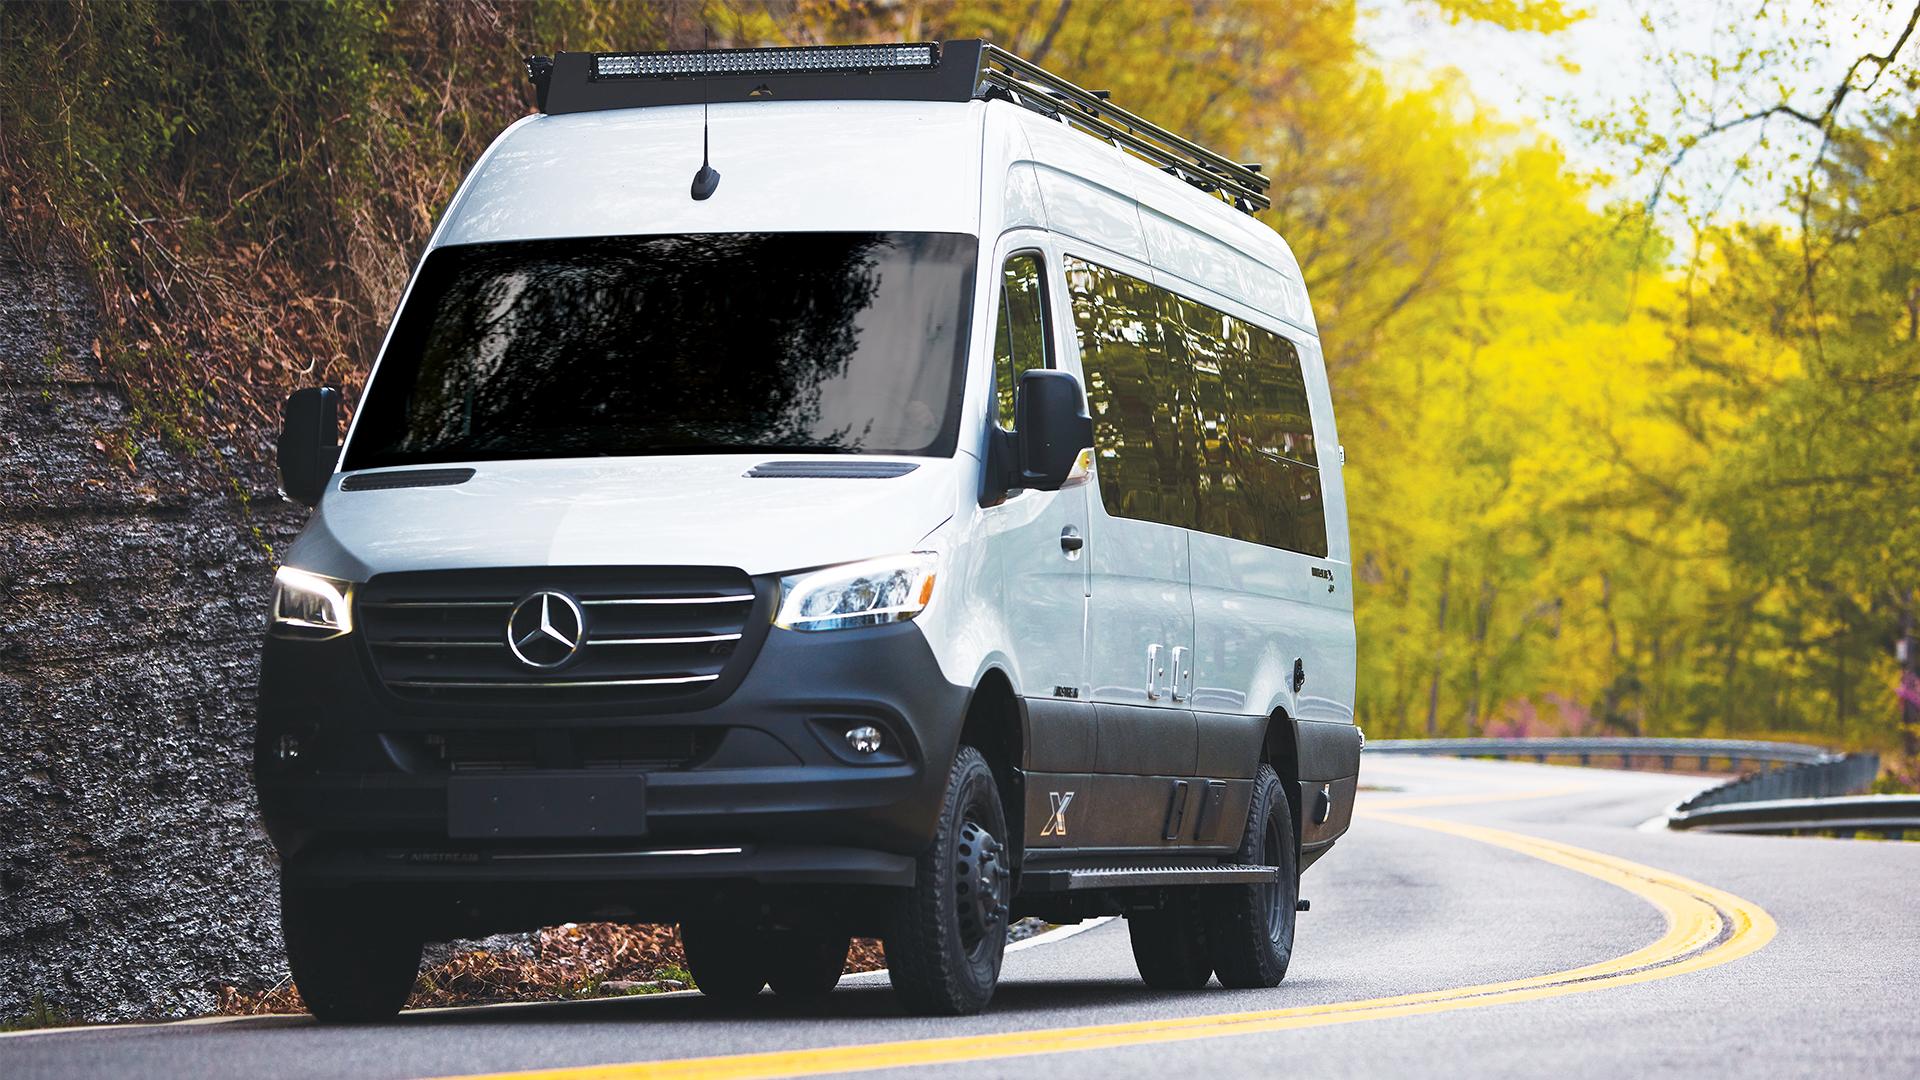 Airstream-Interstate-24X-Touring-Coach-Adventure-Van-Driving-1